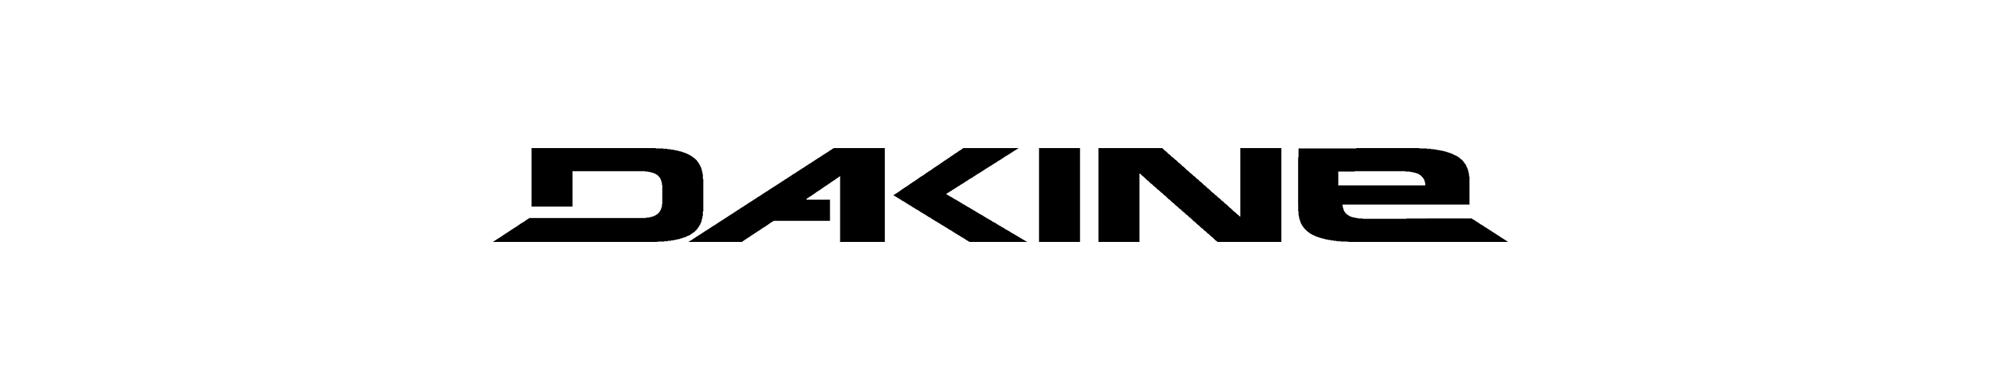 Dakine copy.png